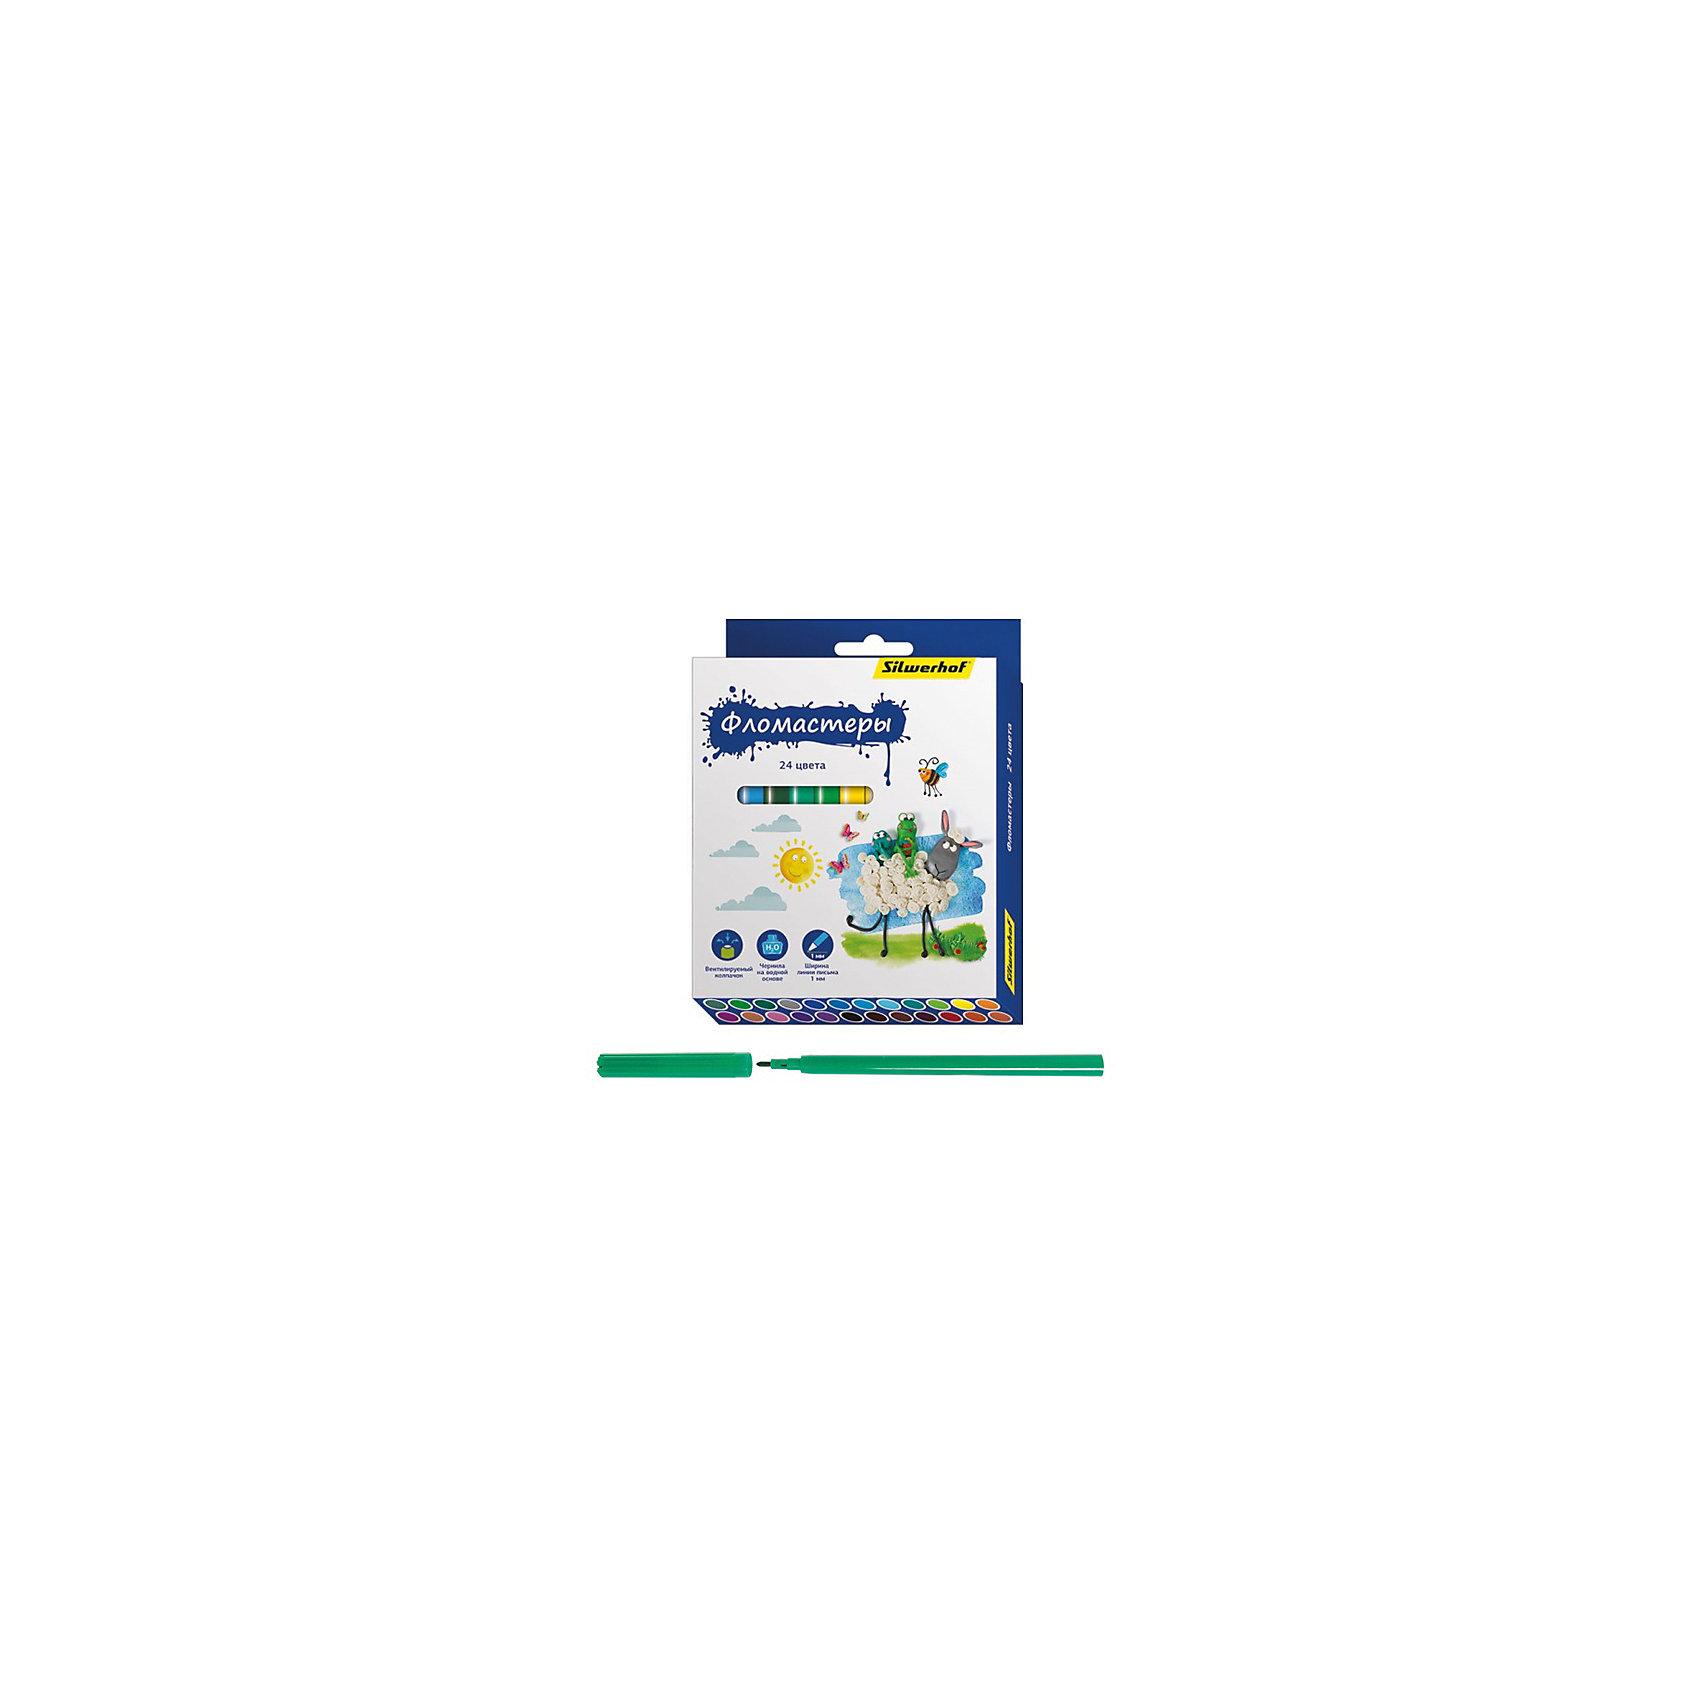 Silwerhof Фломастеры, 24цв, ПЛАСТИЛИНОВАЯ КОЛЛЕКЦИЯ silwerhof пастель масляная джинсовая коллекция набор из 24цв